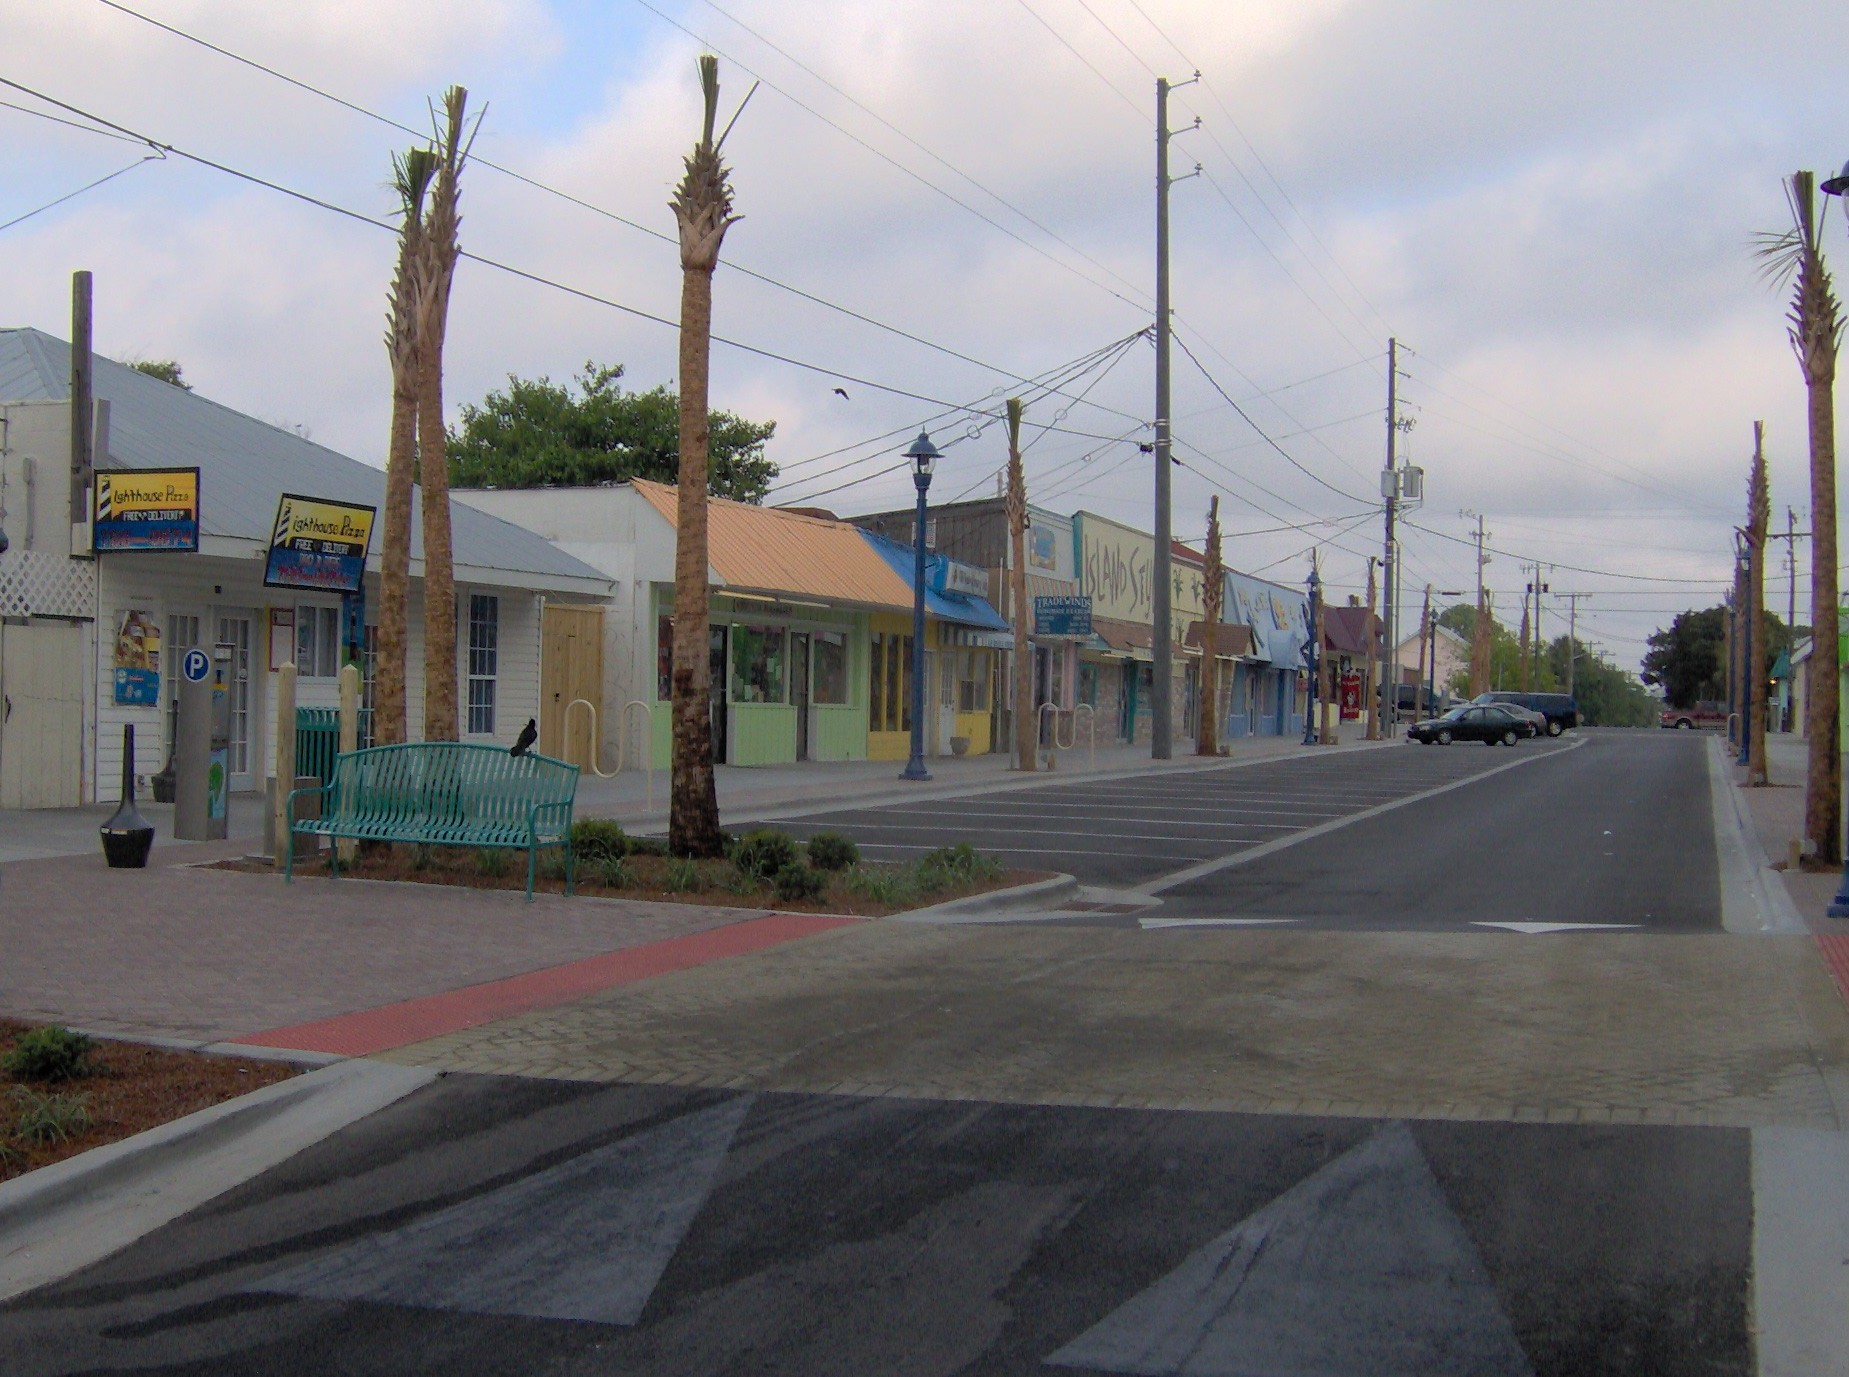 Is Tybee Island Evacuating Because of Hurricane Irma?   Heavy.com